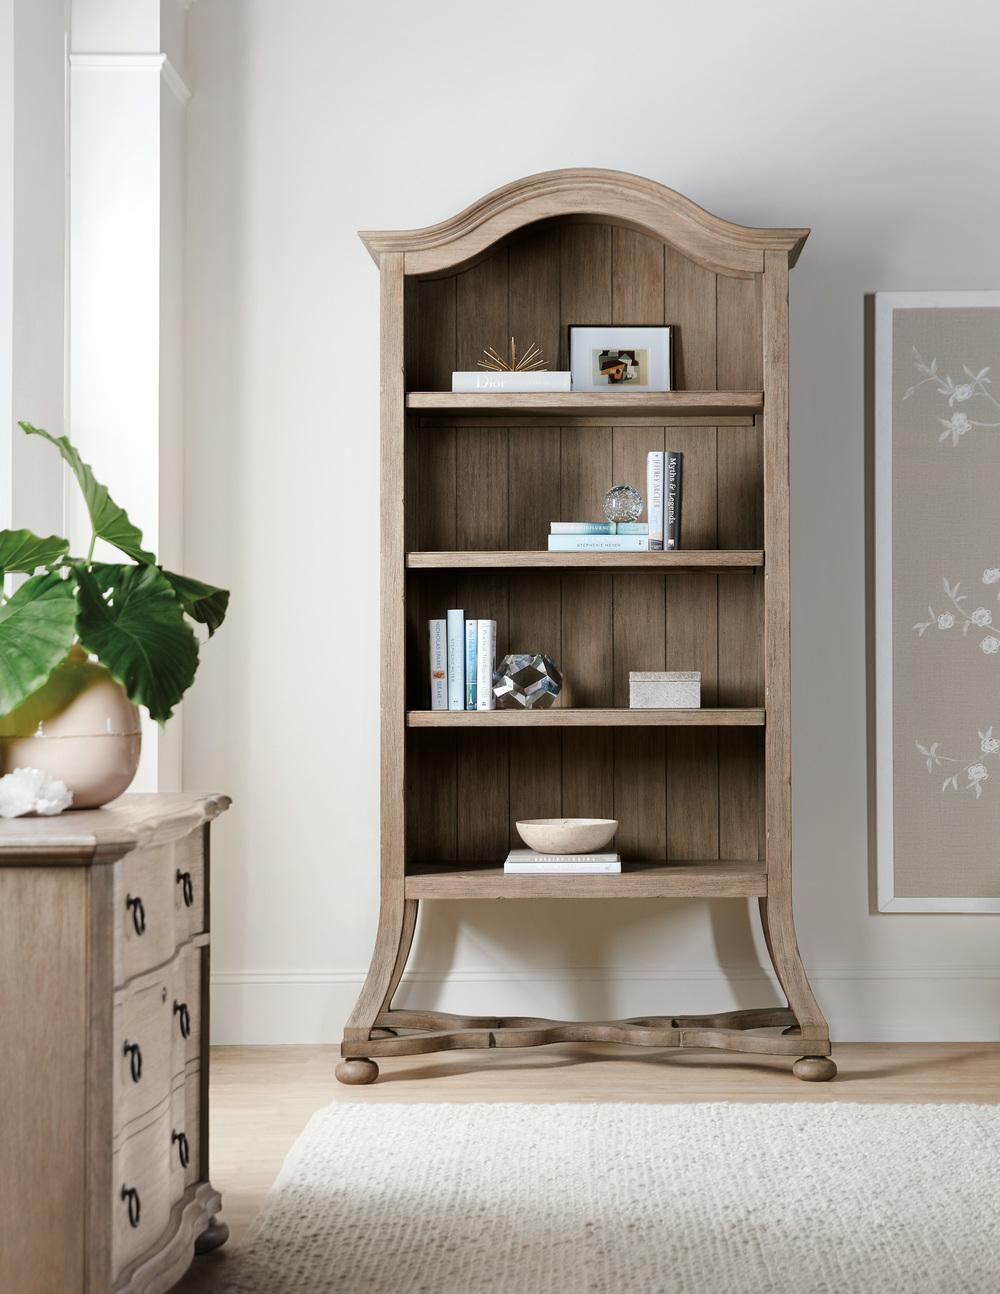 Hooker Furniture - Corsica Bookcase